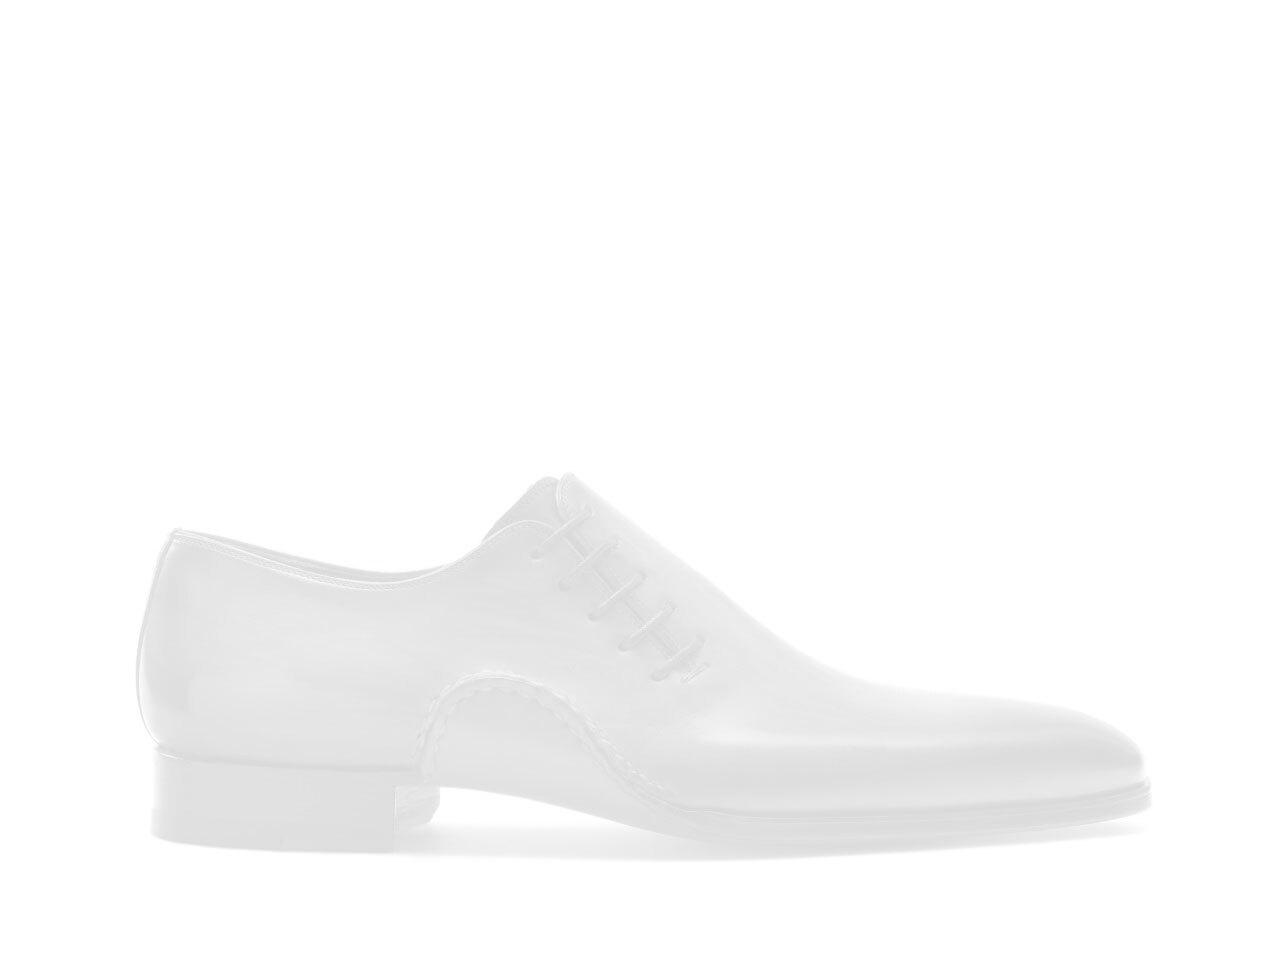 Pair of the Magnanni Marivo Navy Men's Sneakers